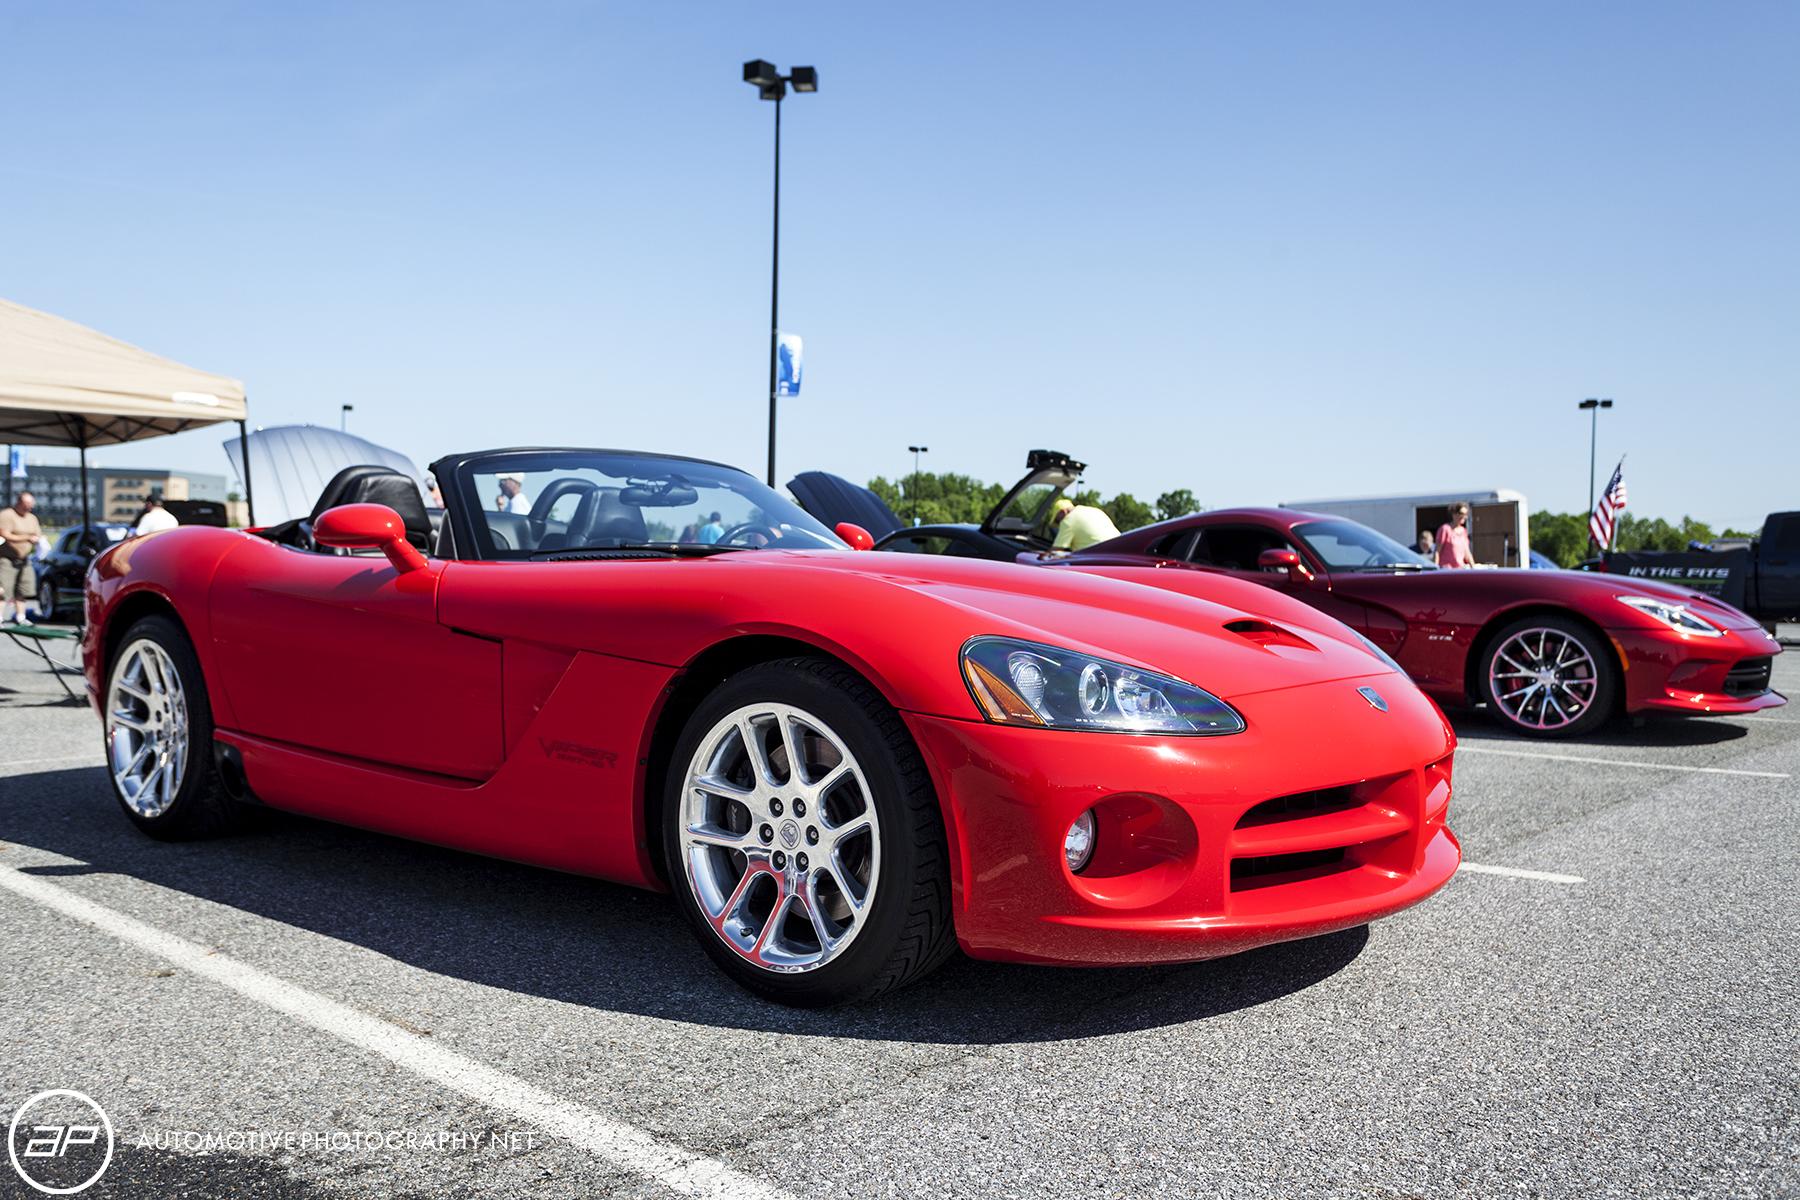 Dodge Viper SRT 10 Red Convertible